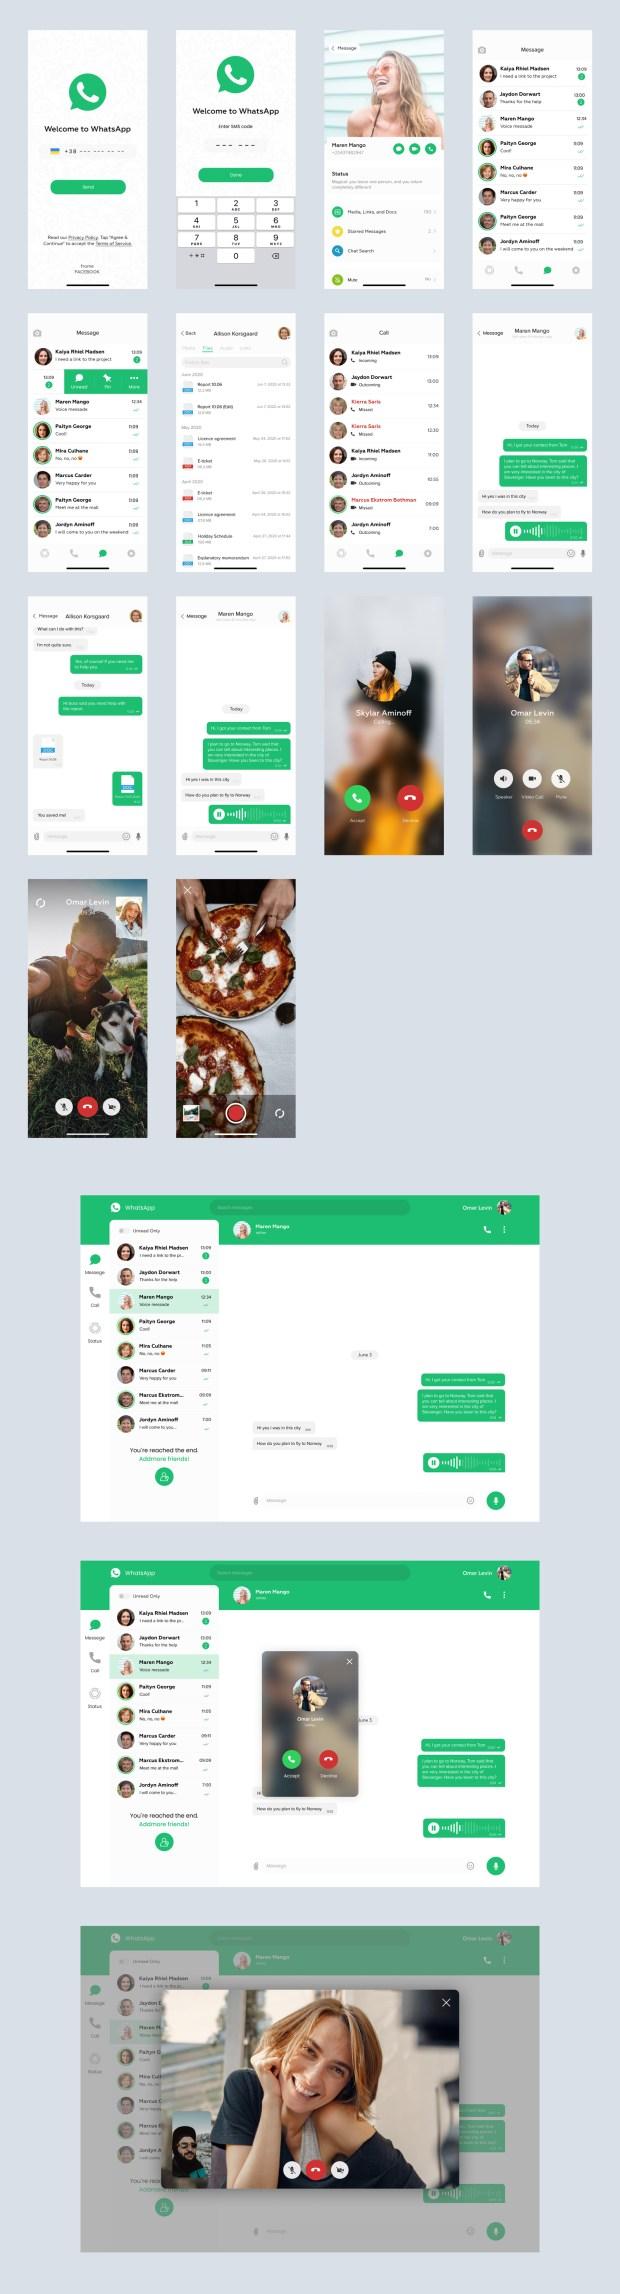 WhatsApp Redesign - Free UI Kit for Figma